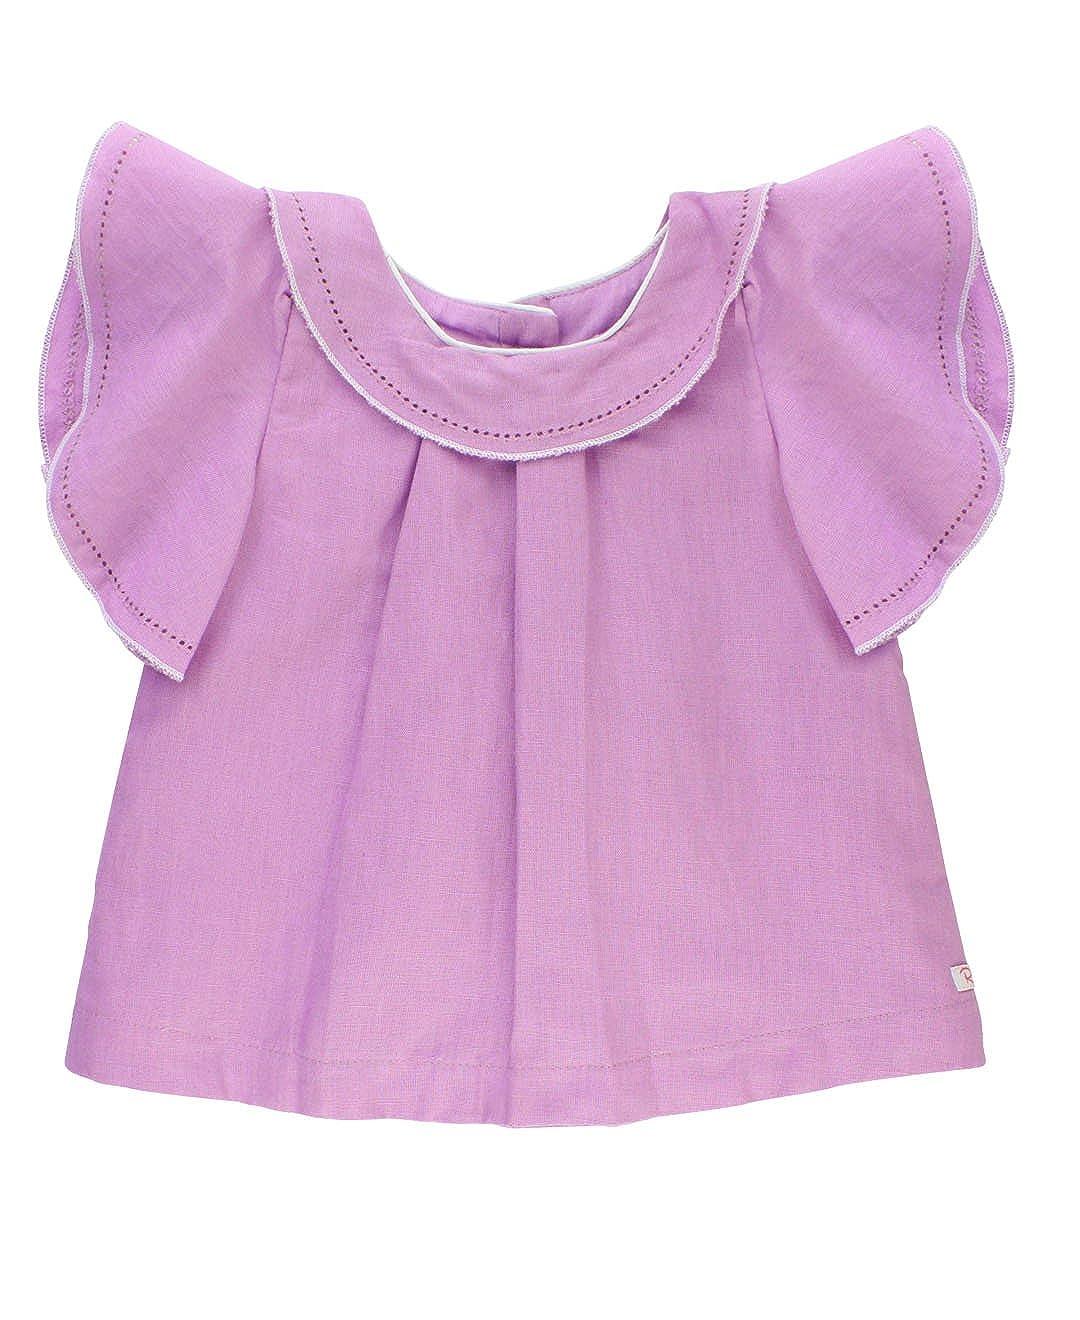 RuffleButts Baby/Toddler Girls Flowy Linen Top w/Flutter Sleeves TTWLLXX-FL00-BABY